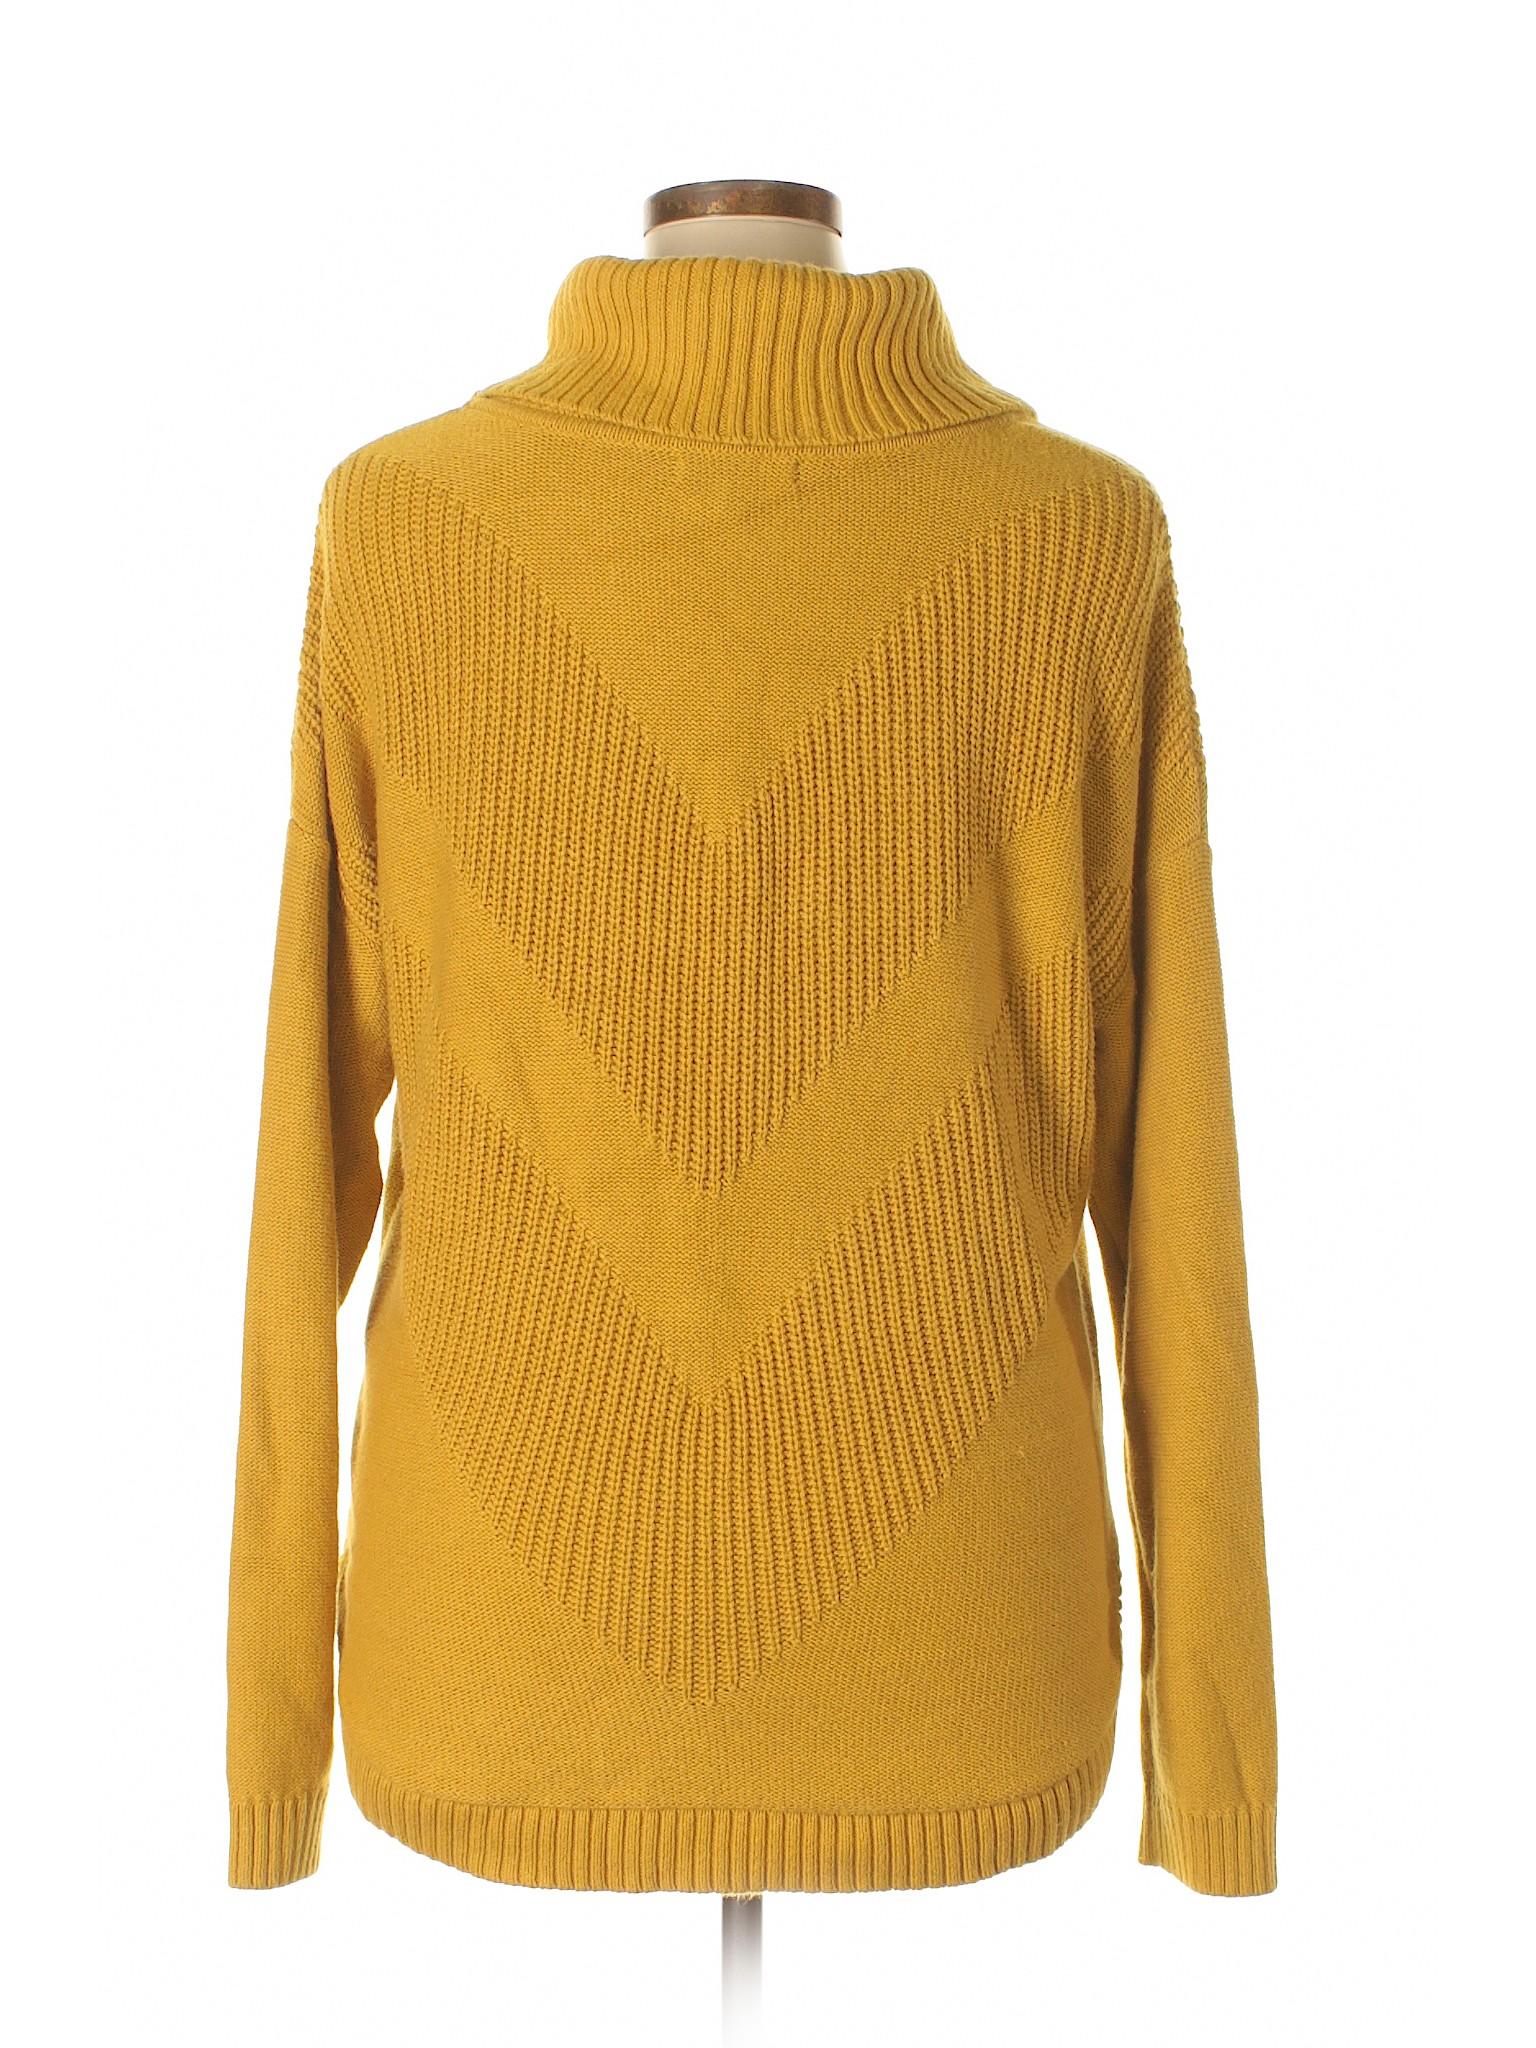 Republic Boutique Sweater winter Banana Turtleneck wfYPZaxpPq